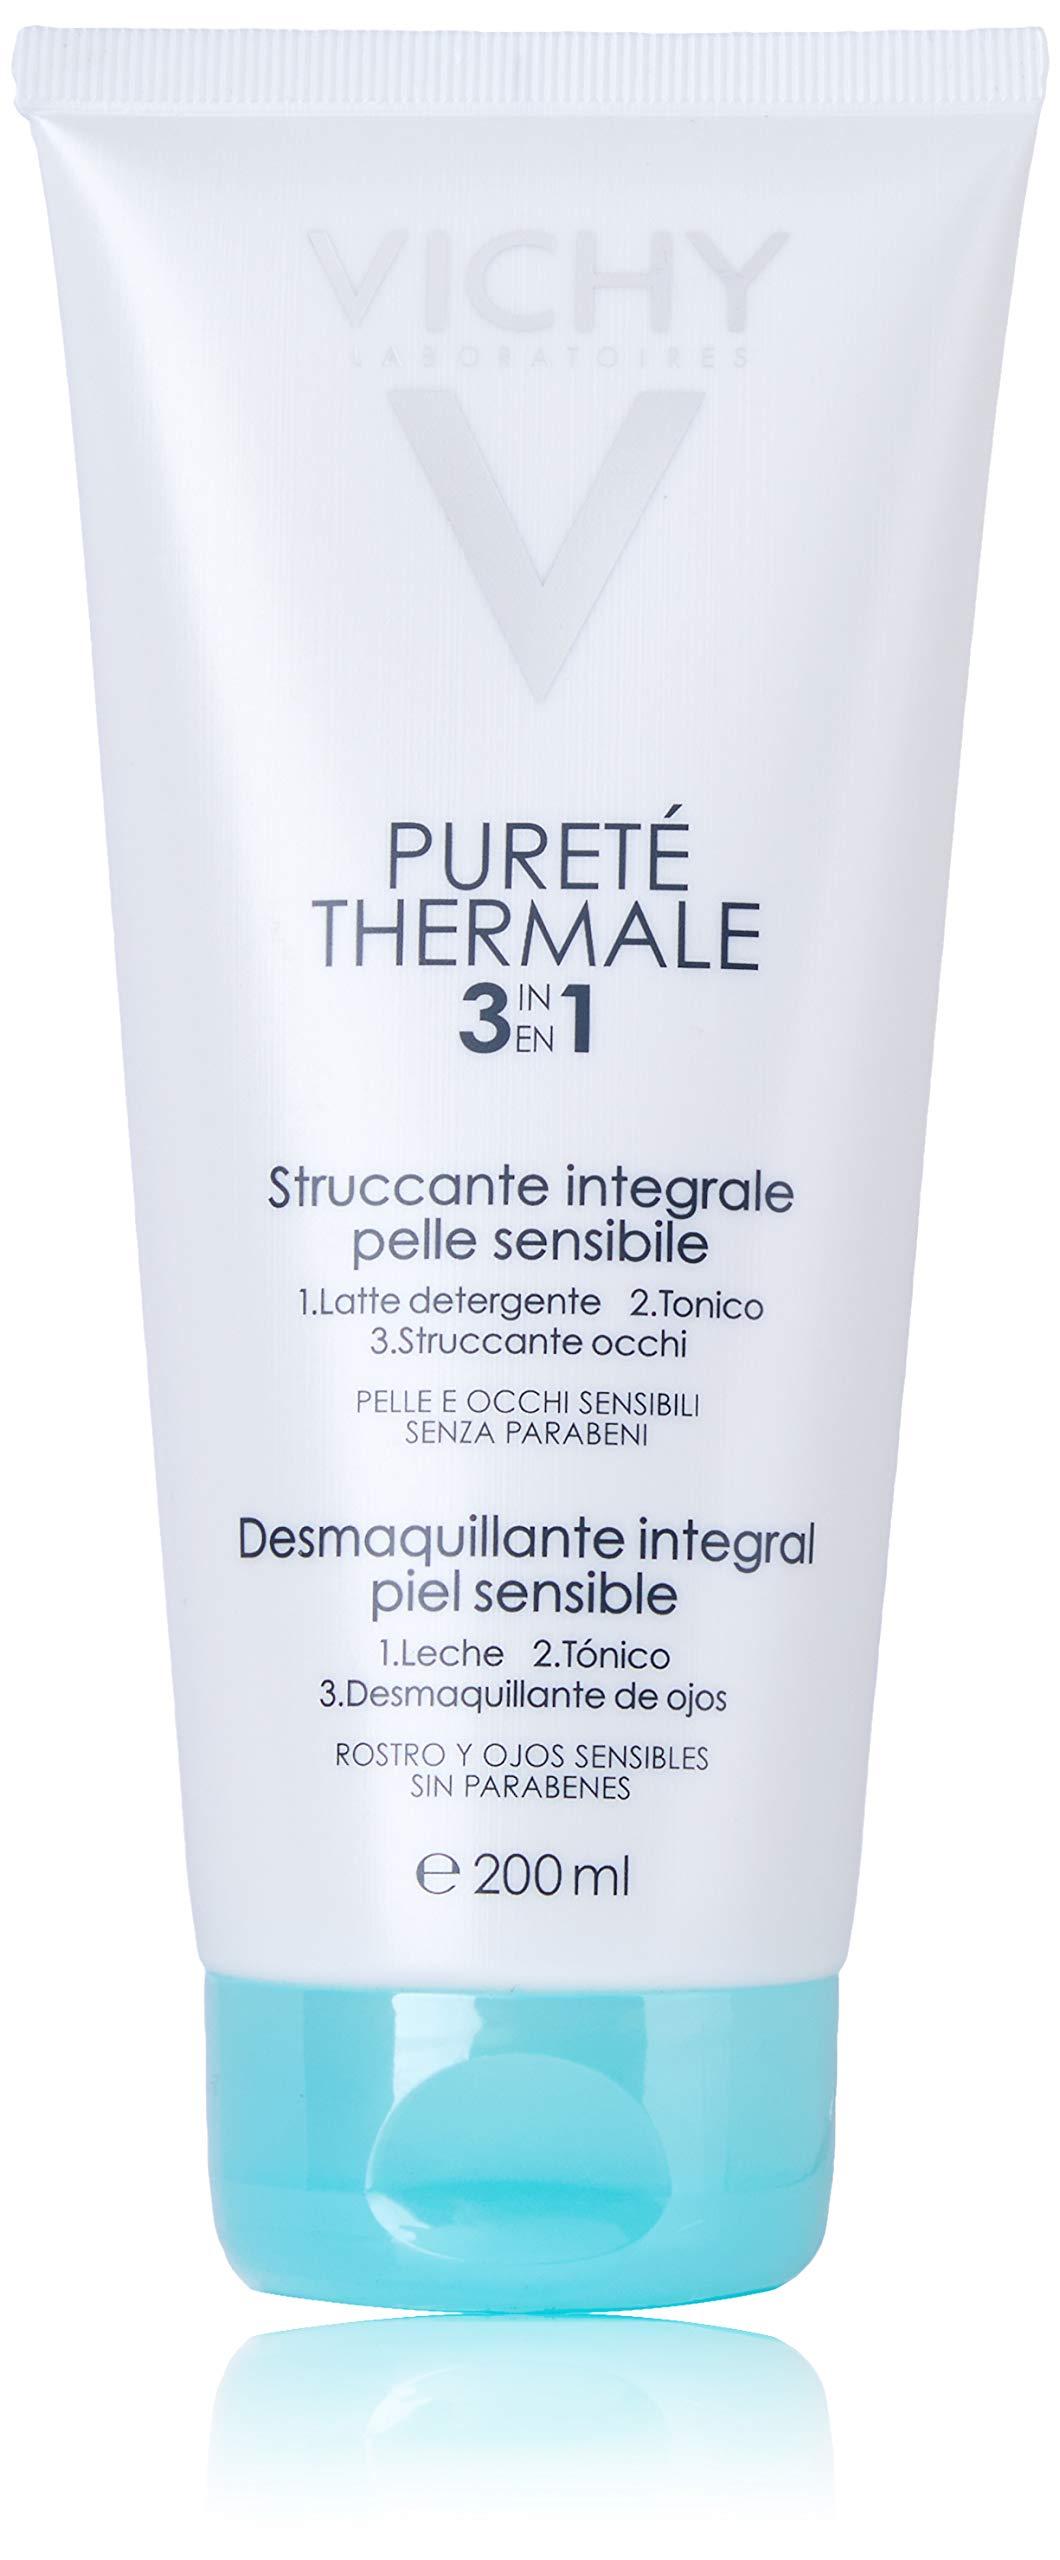 Vichy Pureté Thermale One Step Cleanser for Sensitive Skin, 6.7 Fl Oz